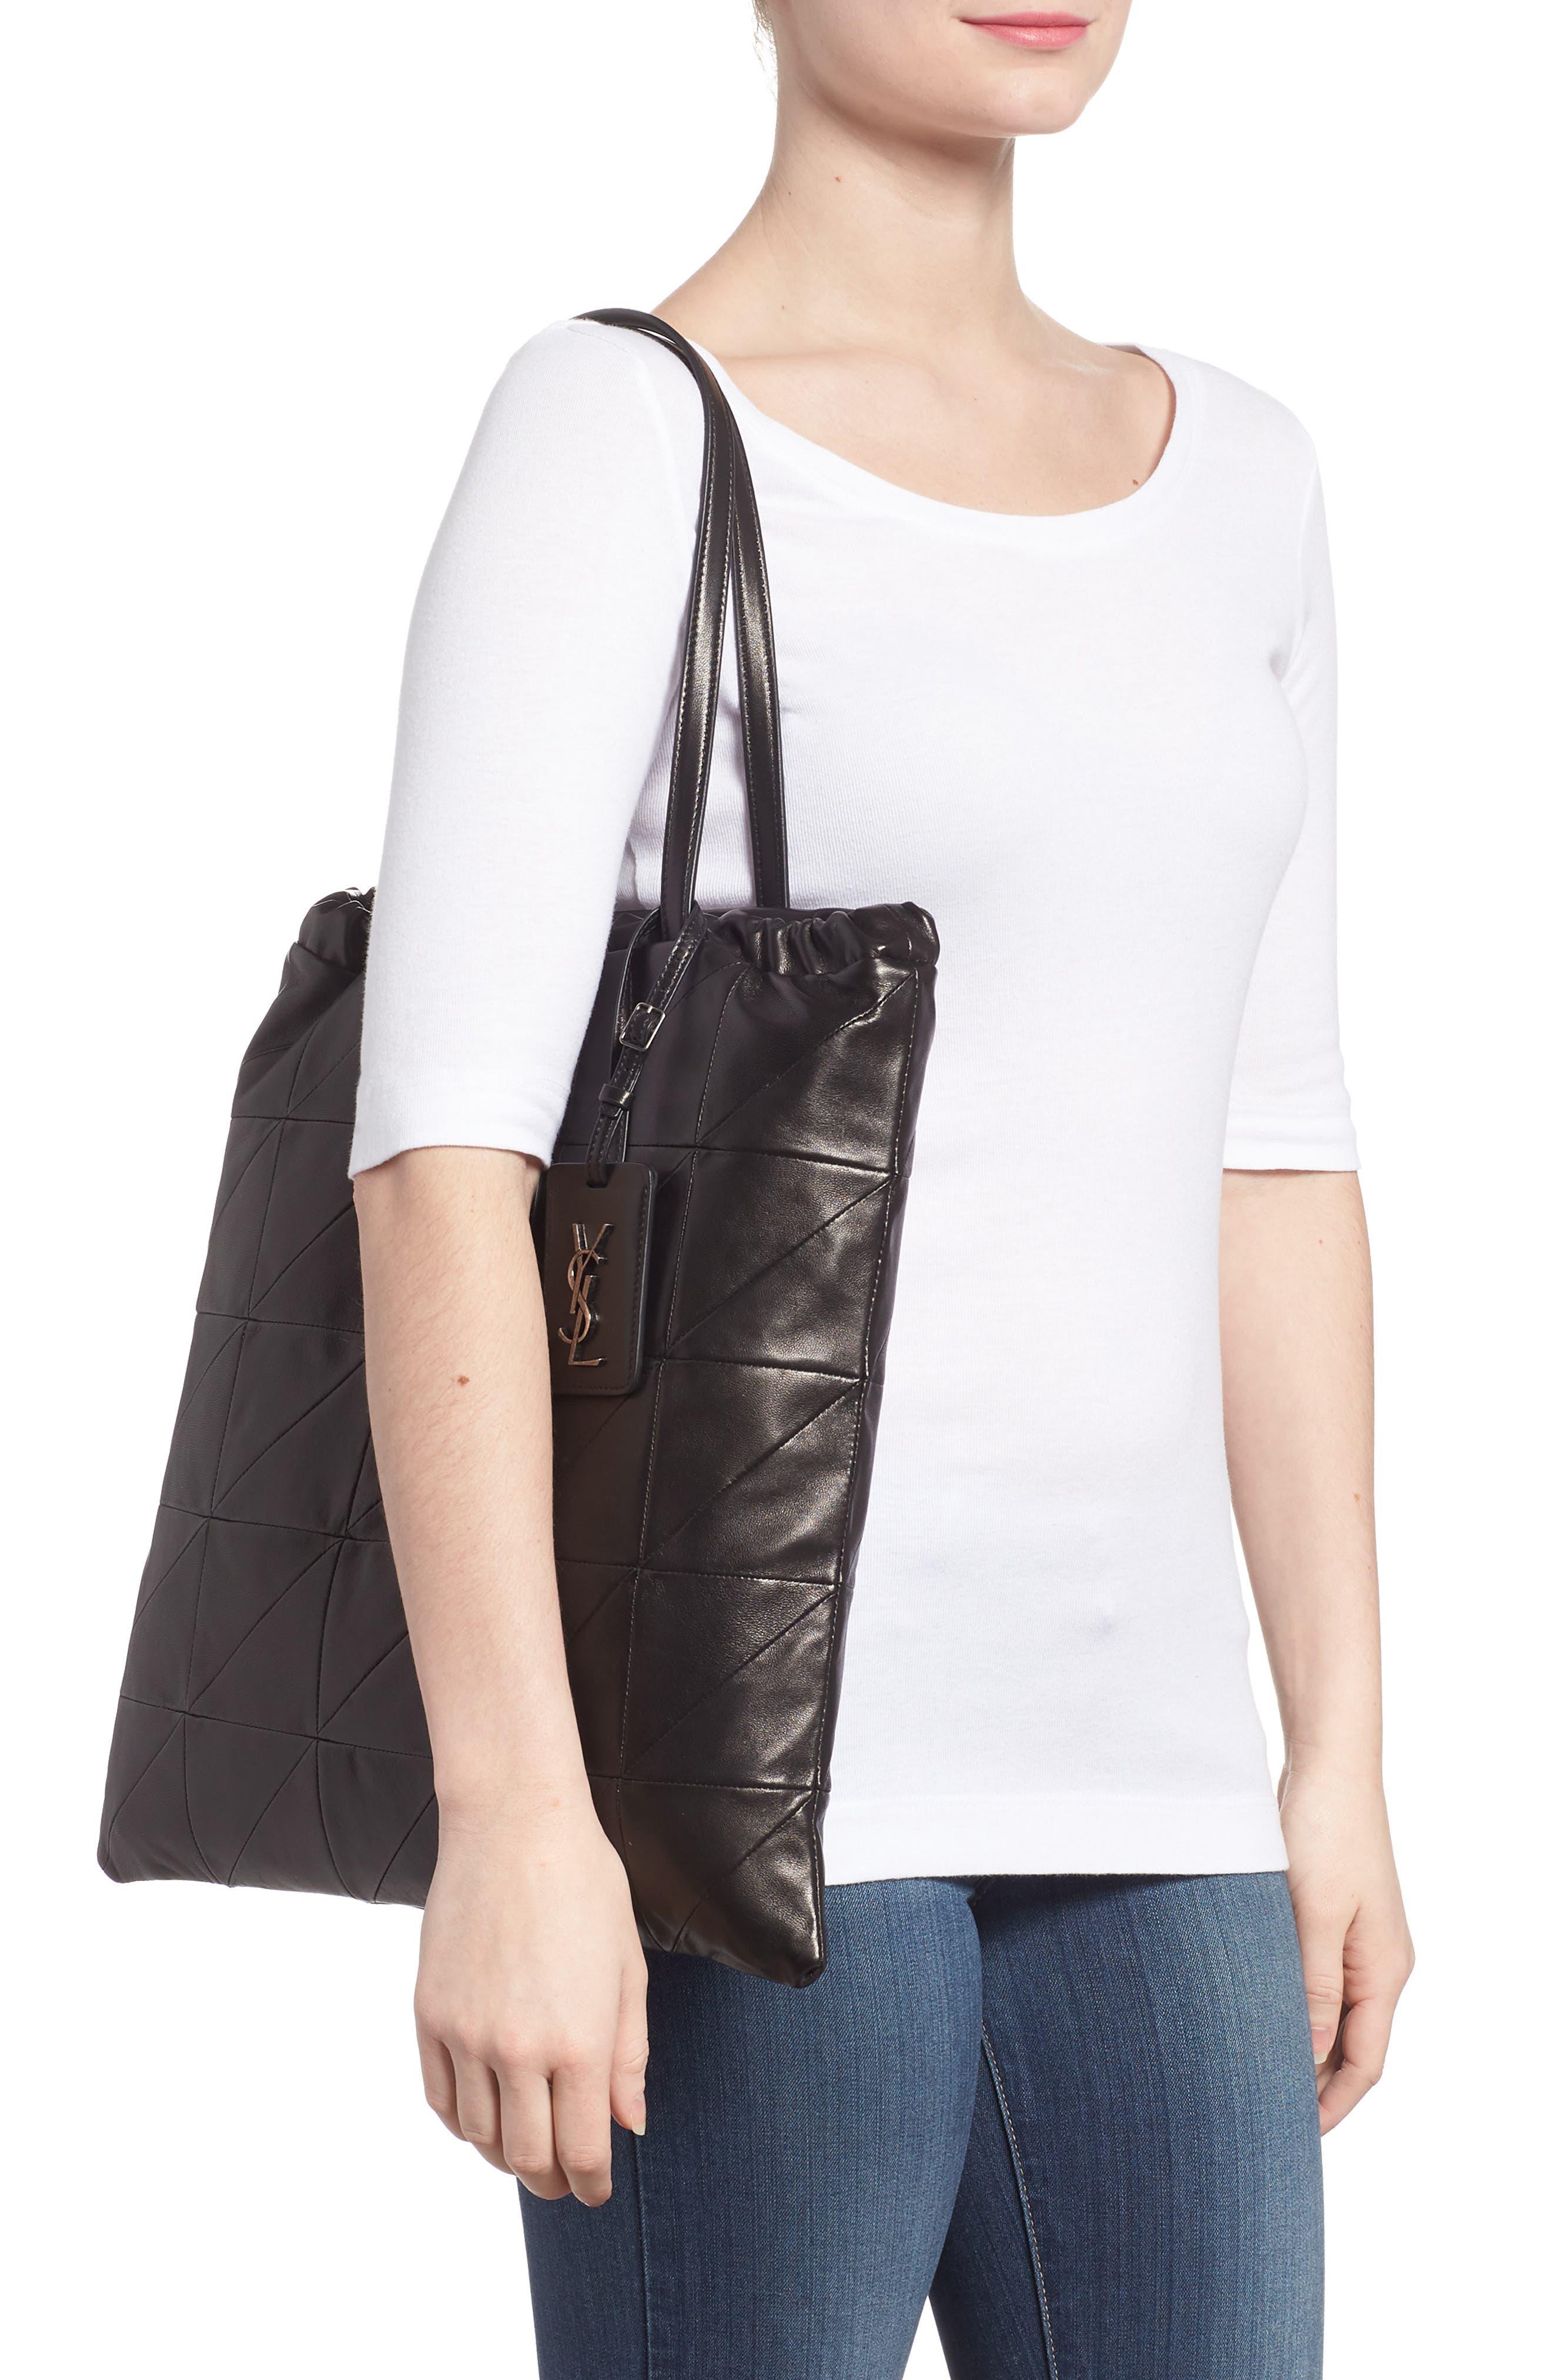 Antibe Flat Leather Shopper,                             Alternate thumbnail 2, color,                             Noir